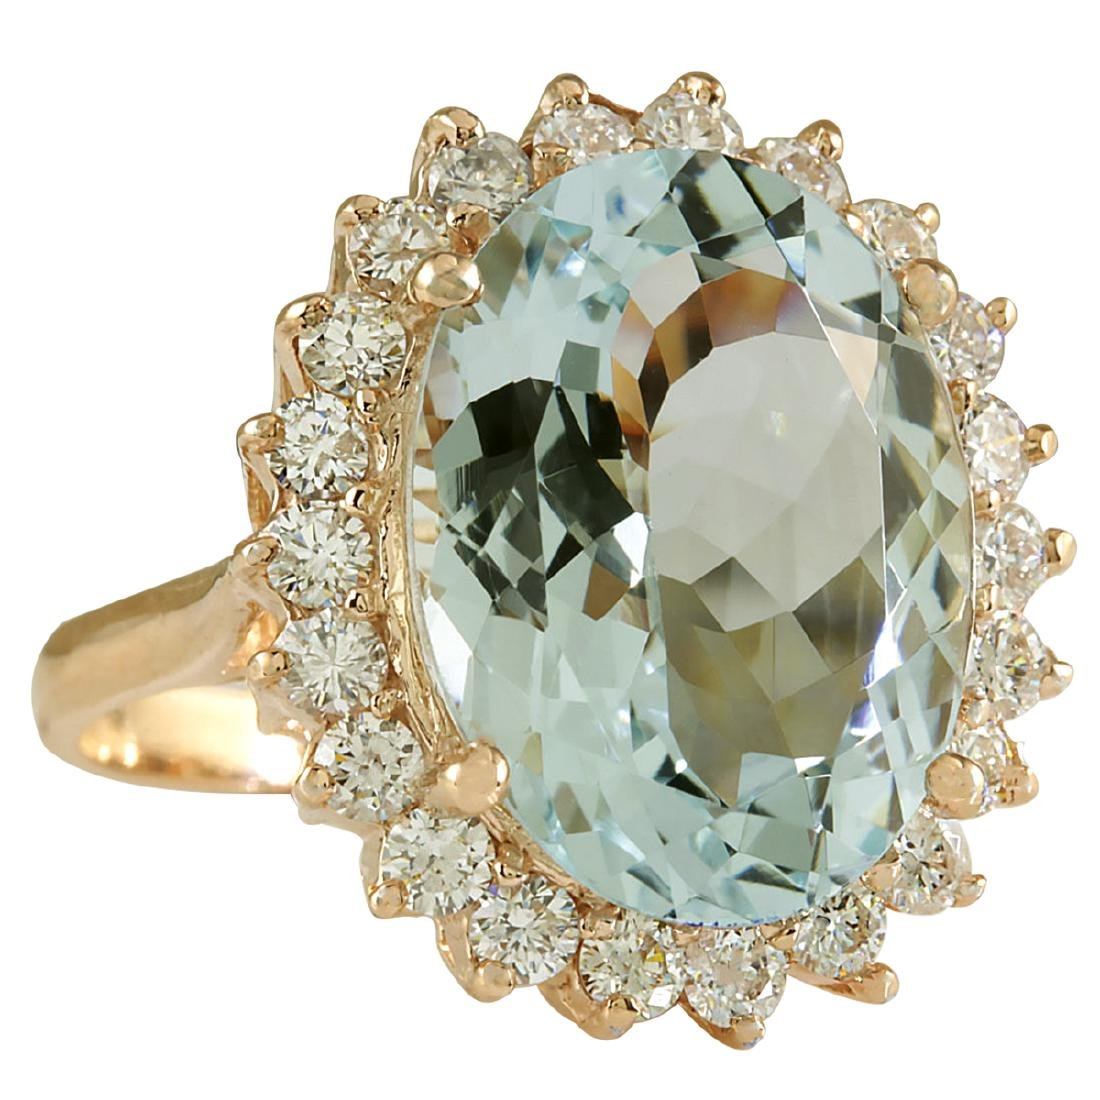 8.40CTW Natural Aquamarine And Diamond Ring In 18K - 2